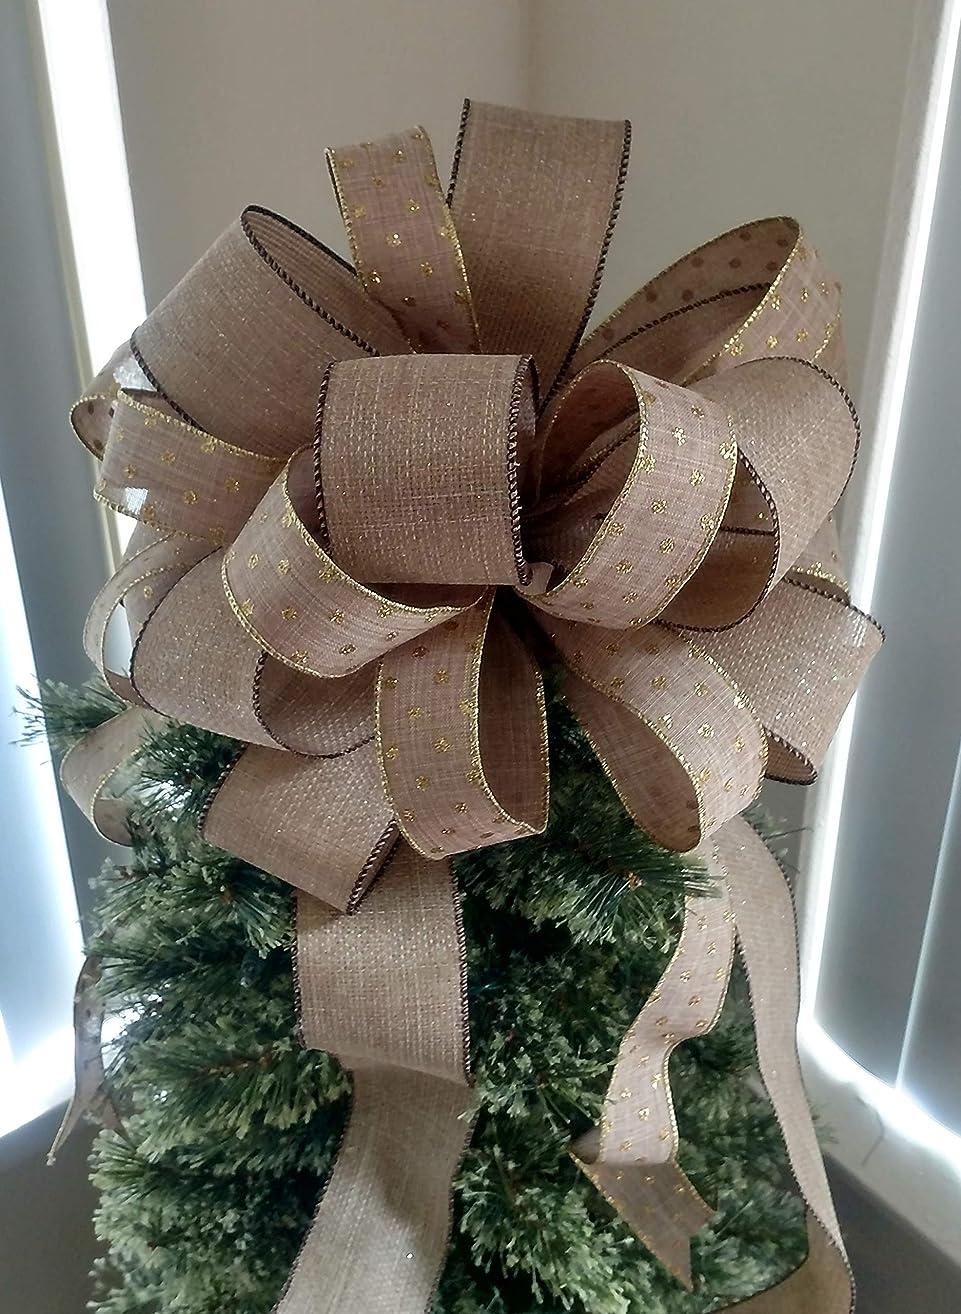 Large burlap Tree Topper Bow - Christmas Tree Topper - Christmas Decoration Bow - Brown Burlap and Gold Polka Dot Tree Tops